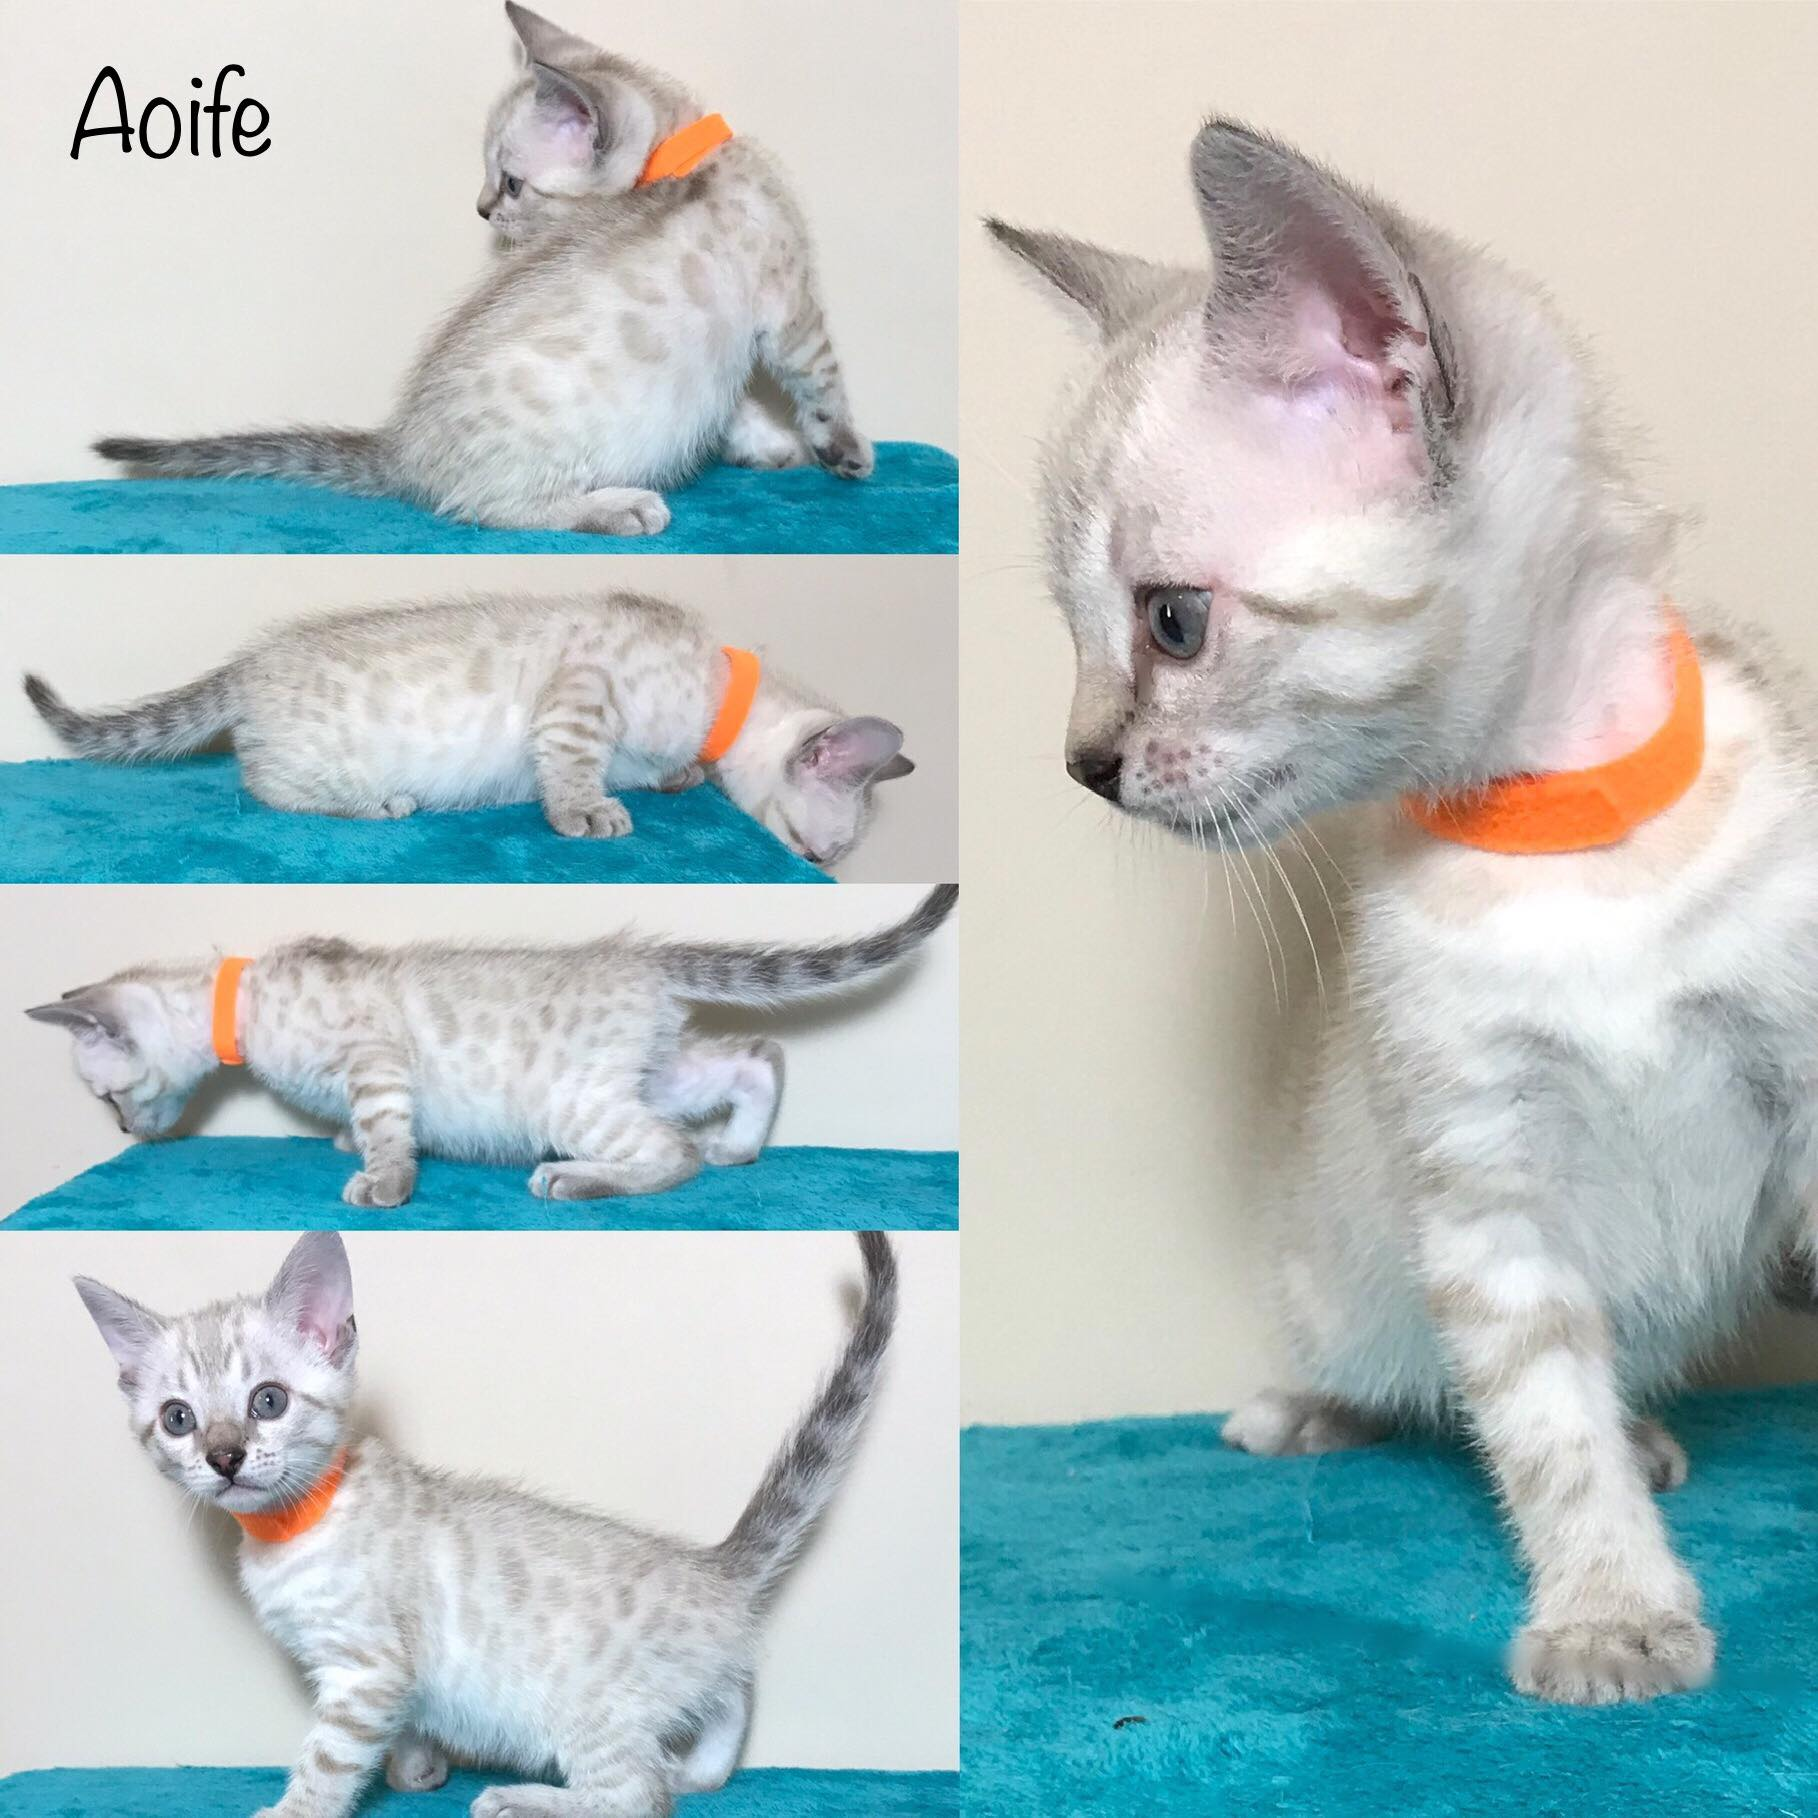 Aoife 6 weeks